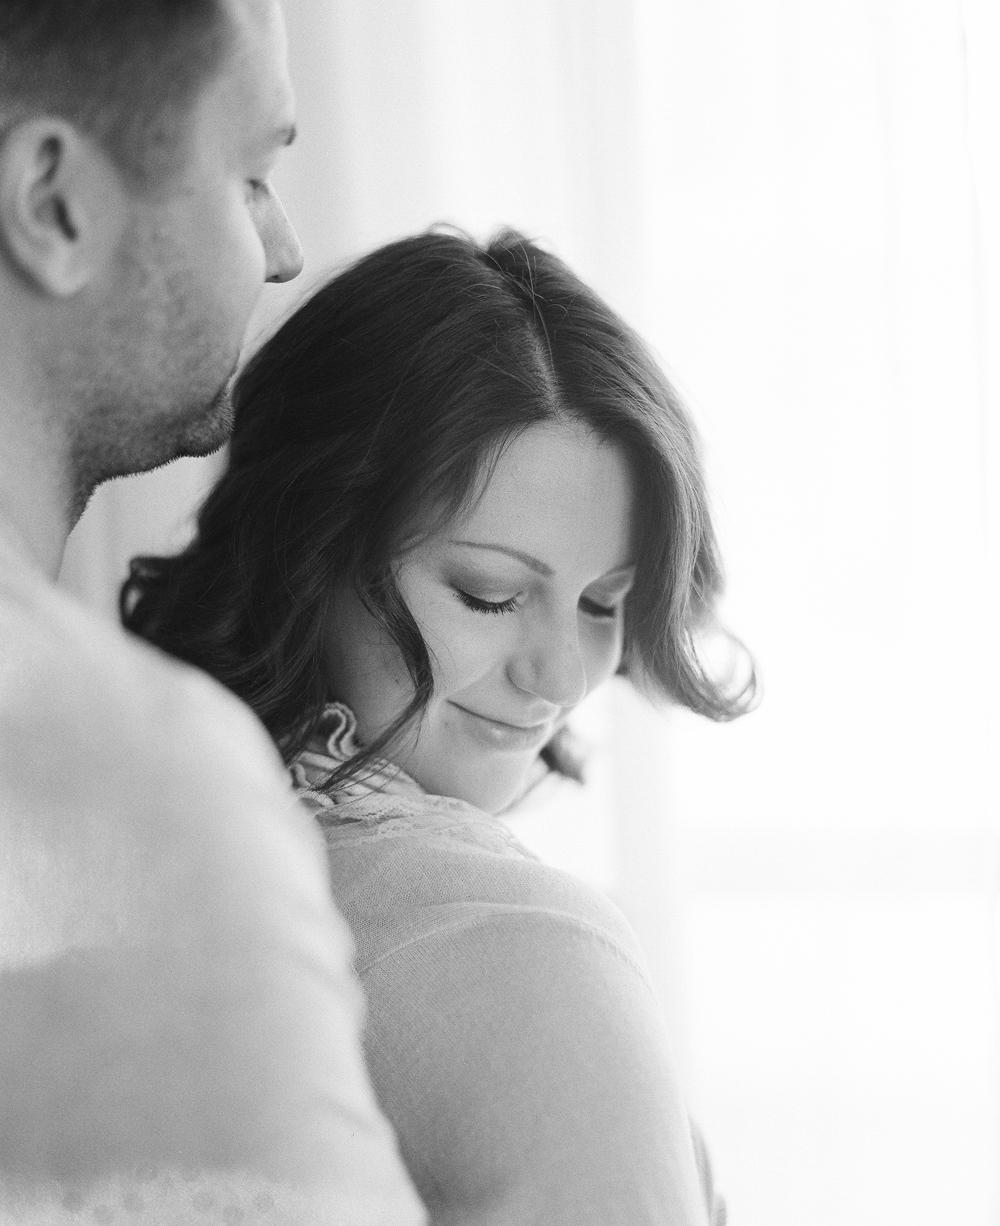 wausau-maternity-photography-film-004.jpg